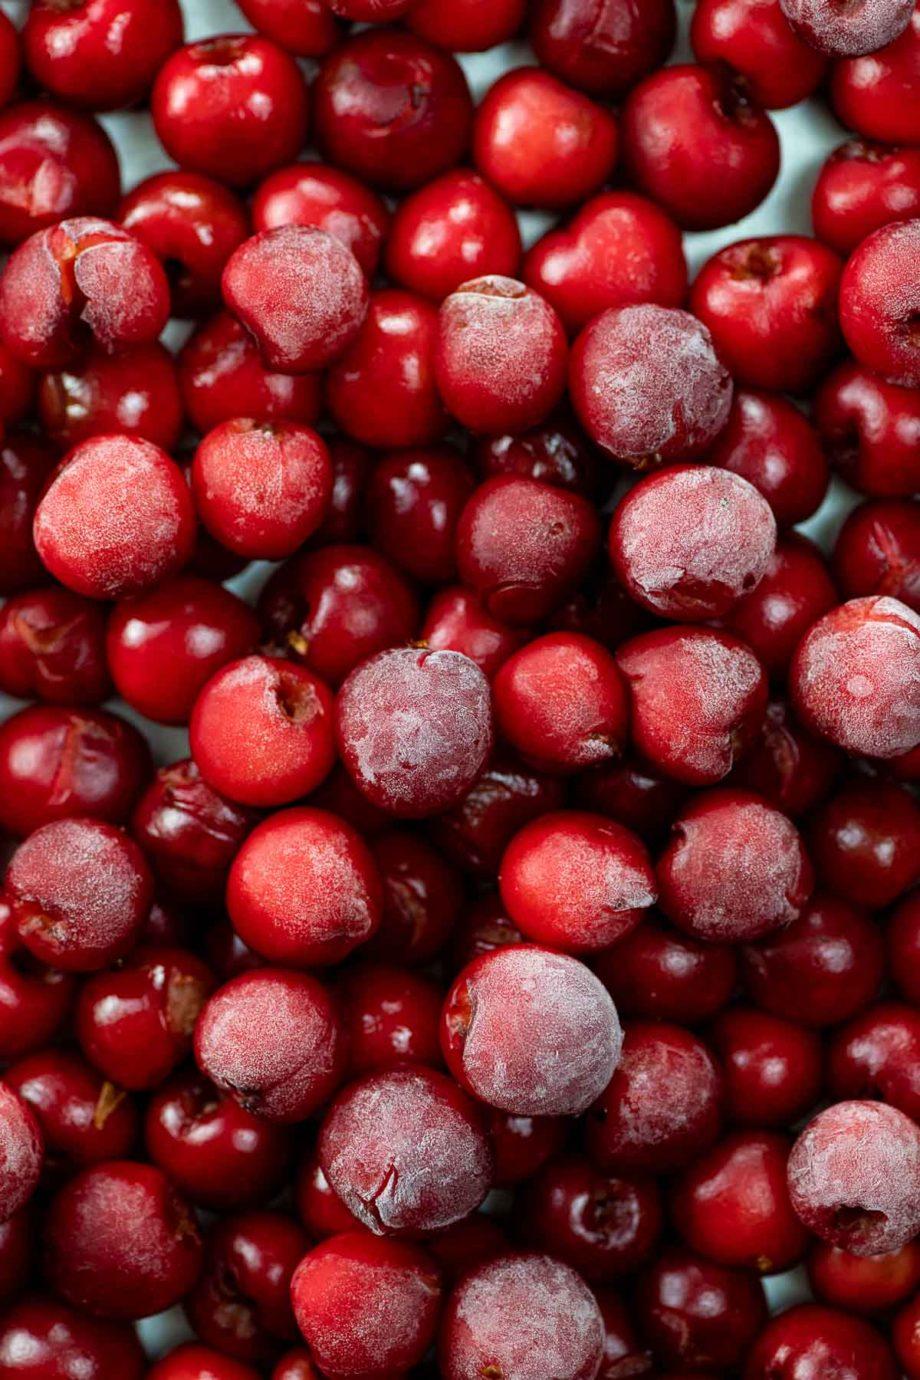 sour cherries on a baking sheet